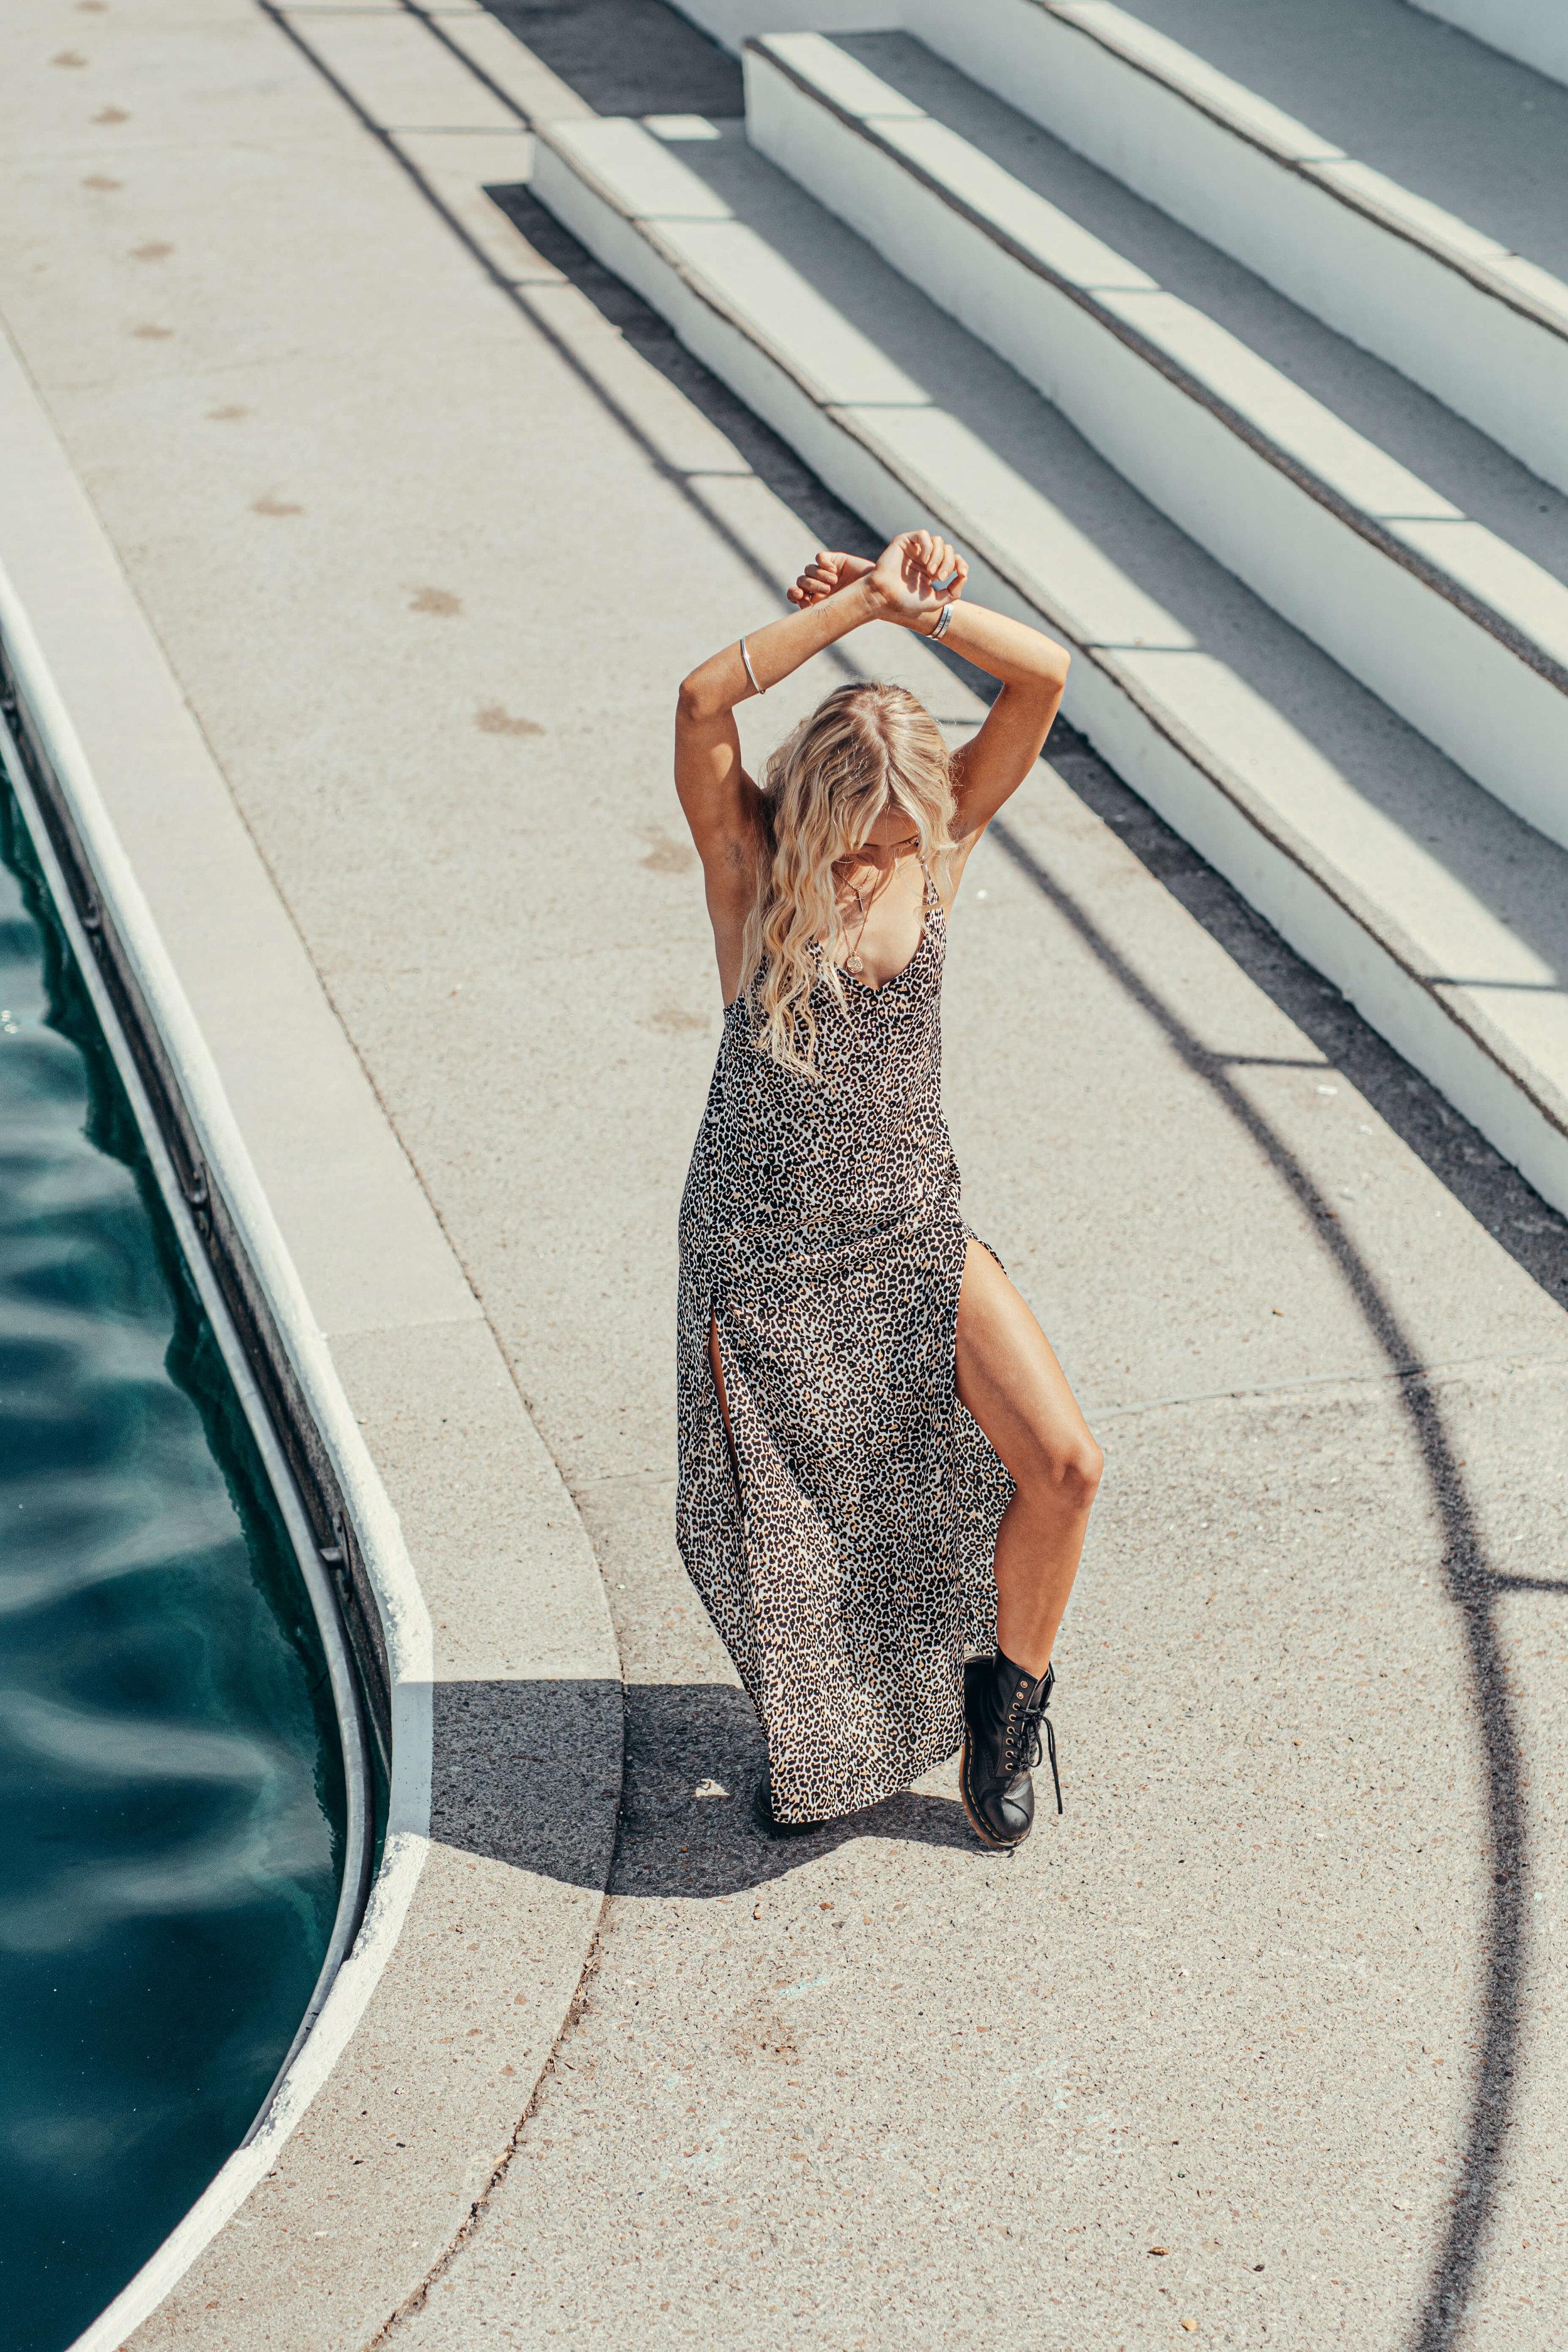 destination fashion photographer